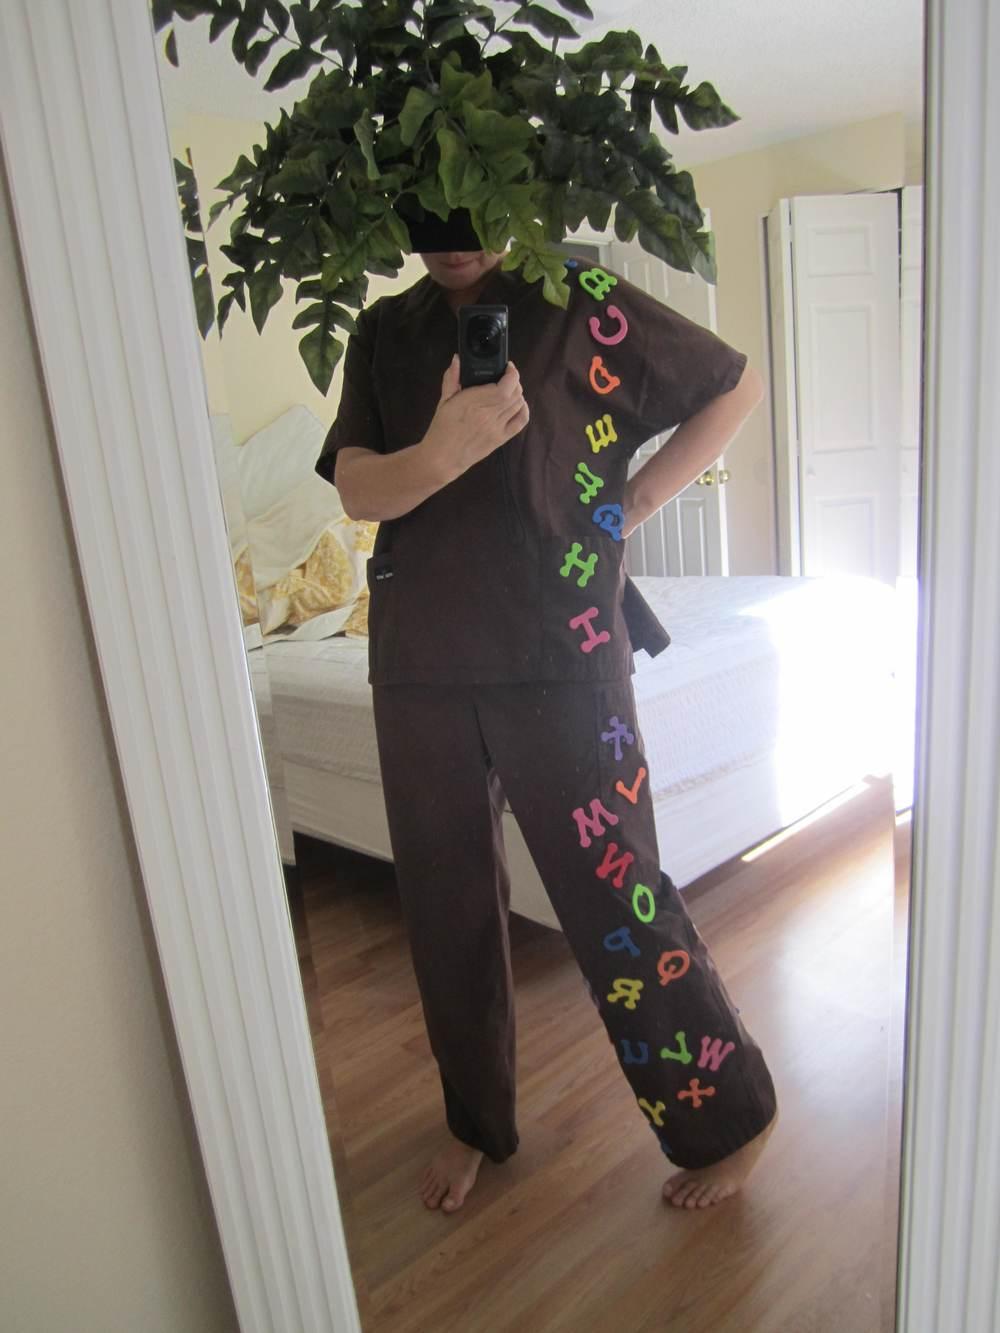 To make this costume hot glue bathtub alphabet letters onto some brown scrubs. Then attach some fake ferns to a hat or headband. Ta Dah! & 21 Costume Ideas for Teachers u2014 Kindergarten Kiosk